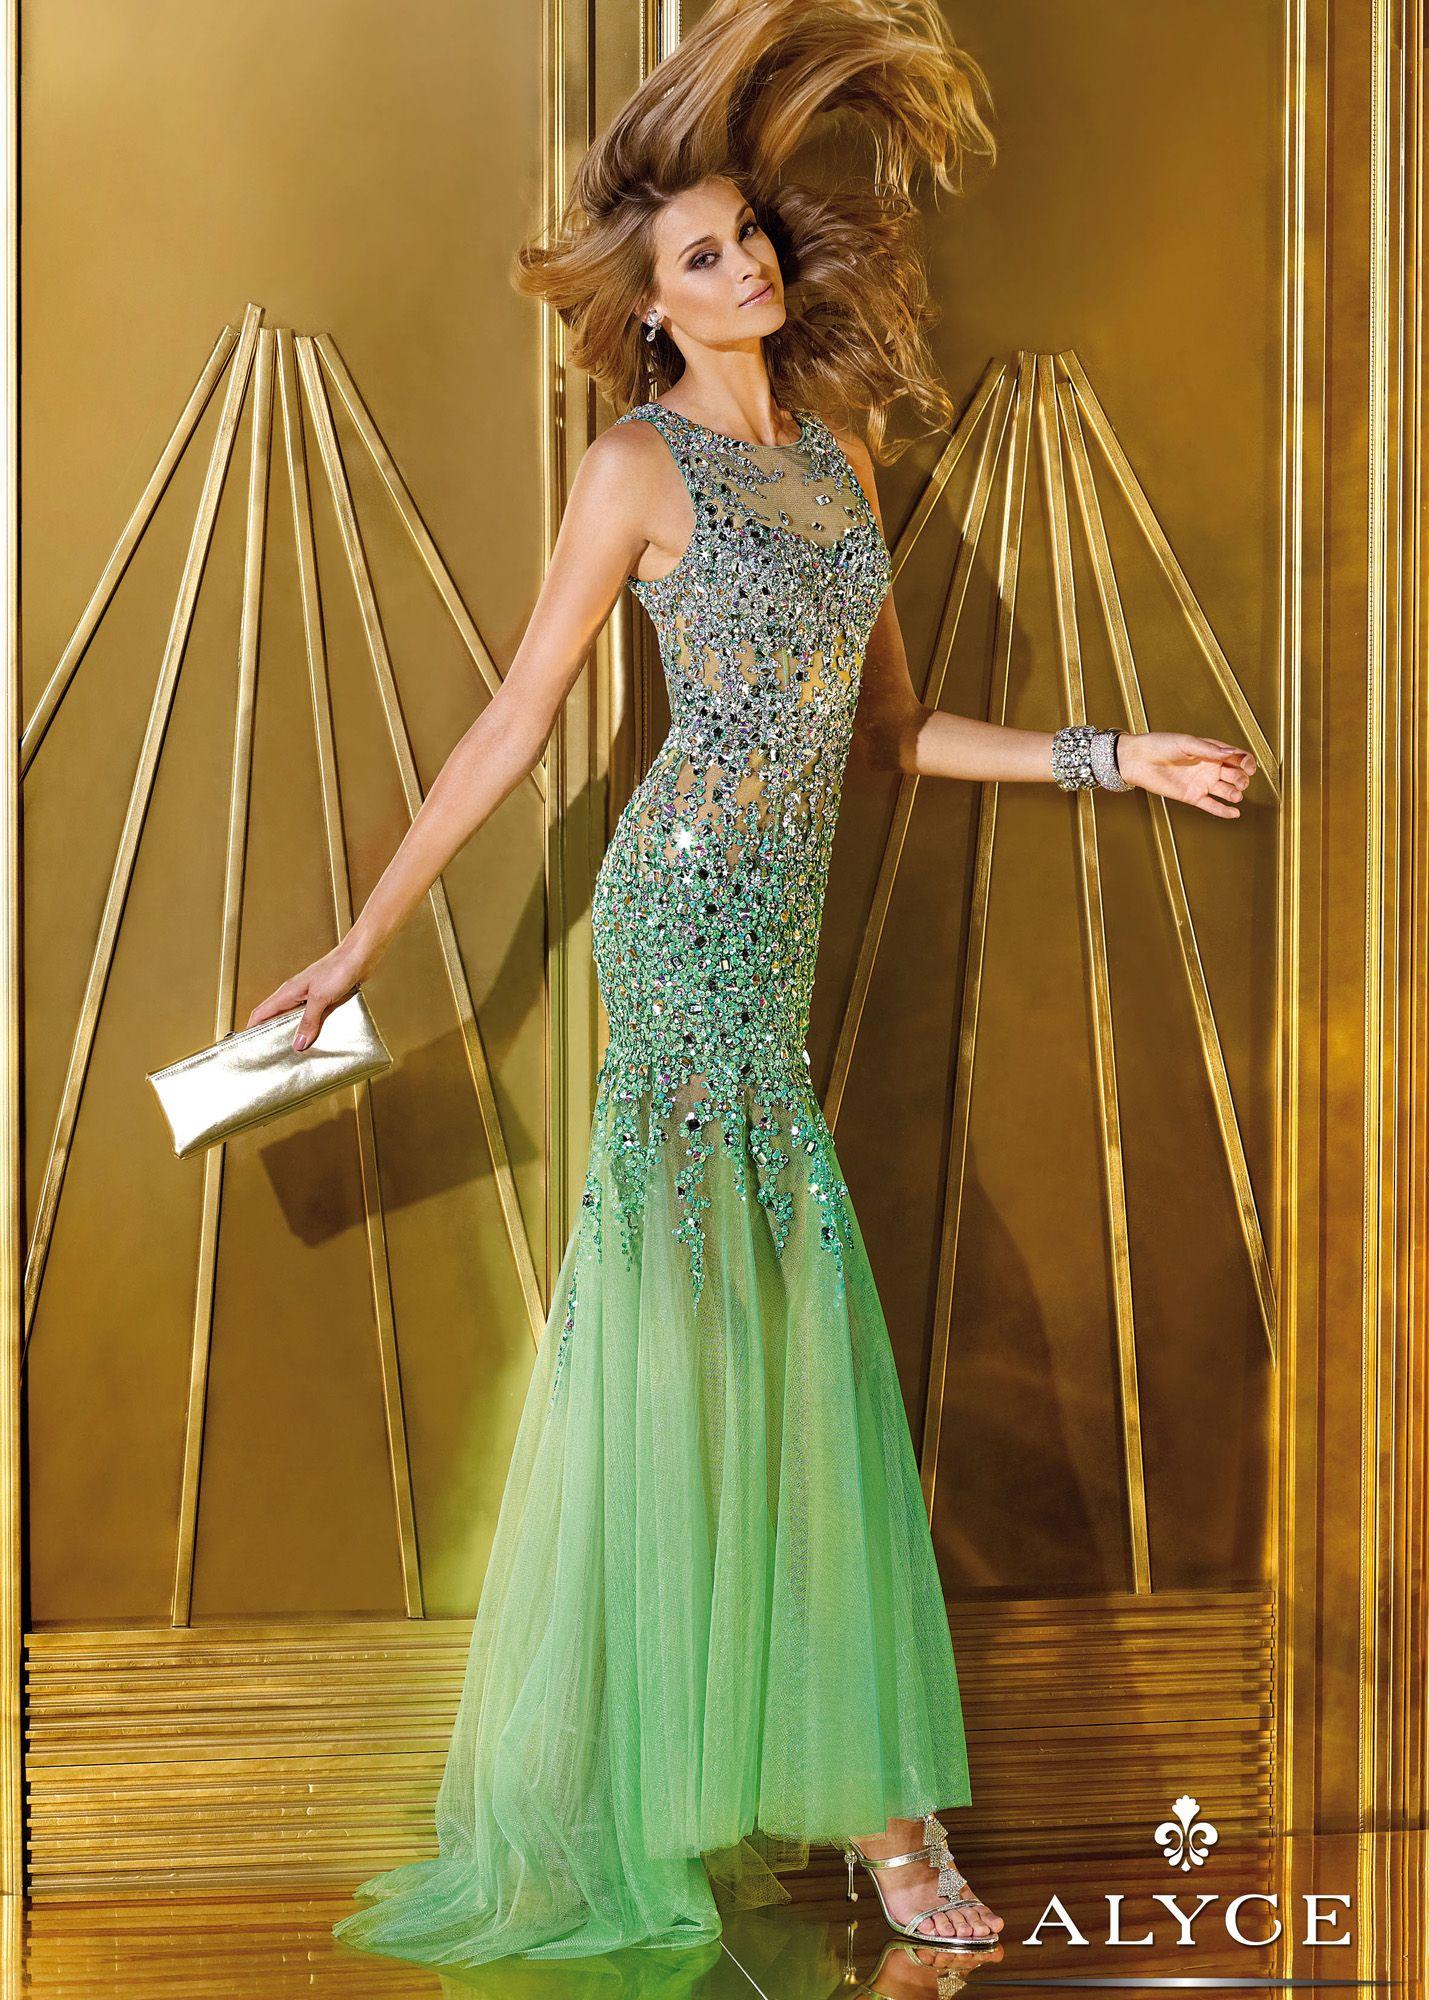 Green dress prom  Alyce Prom   Absinthe Sheer Beaded Mermaid Prom Dresses Online